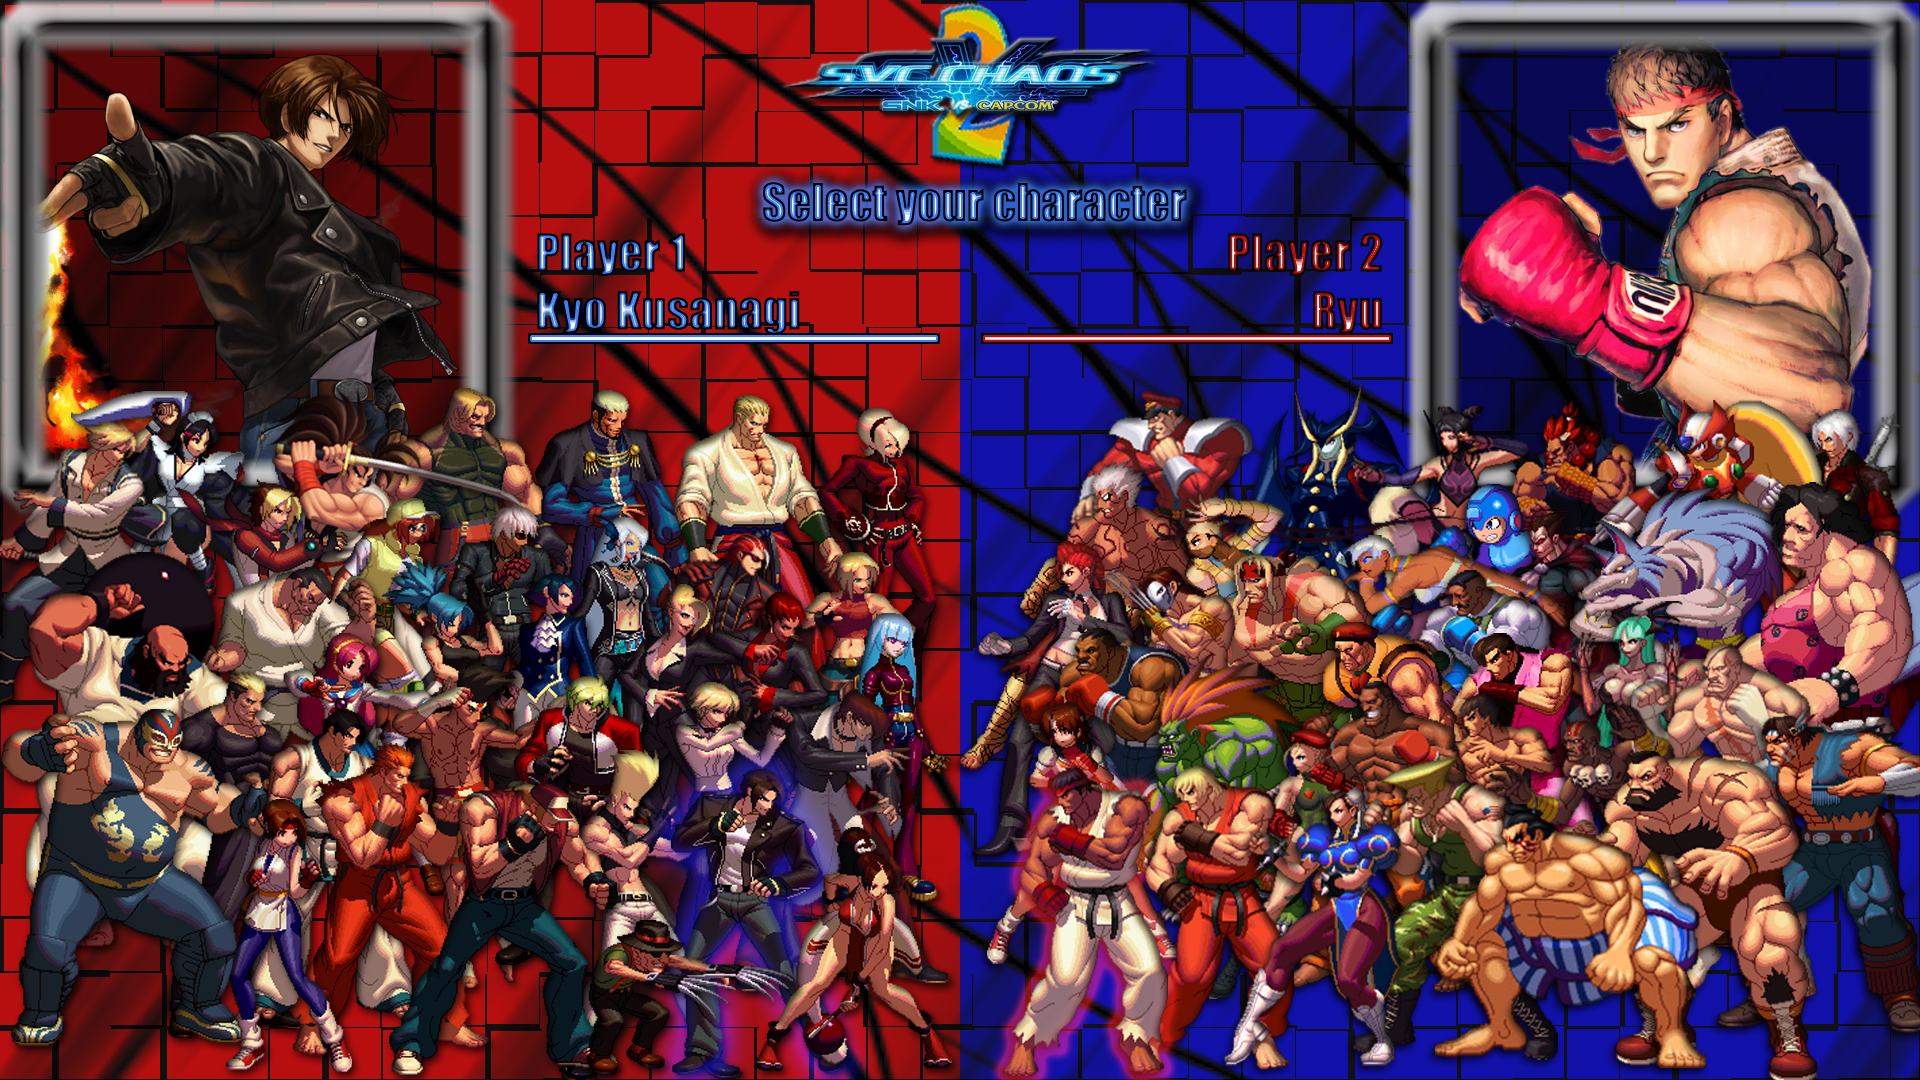 48+ Capcom vs SNK 2 Wallpaper on WallpaperSafari